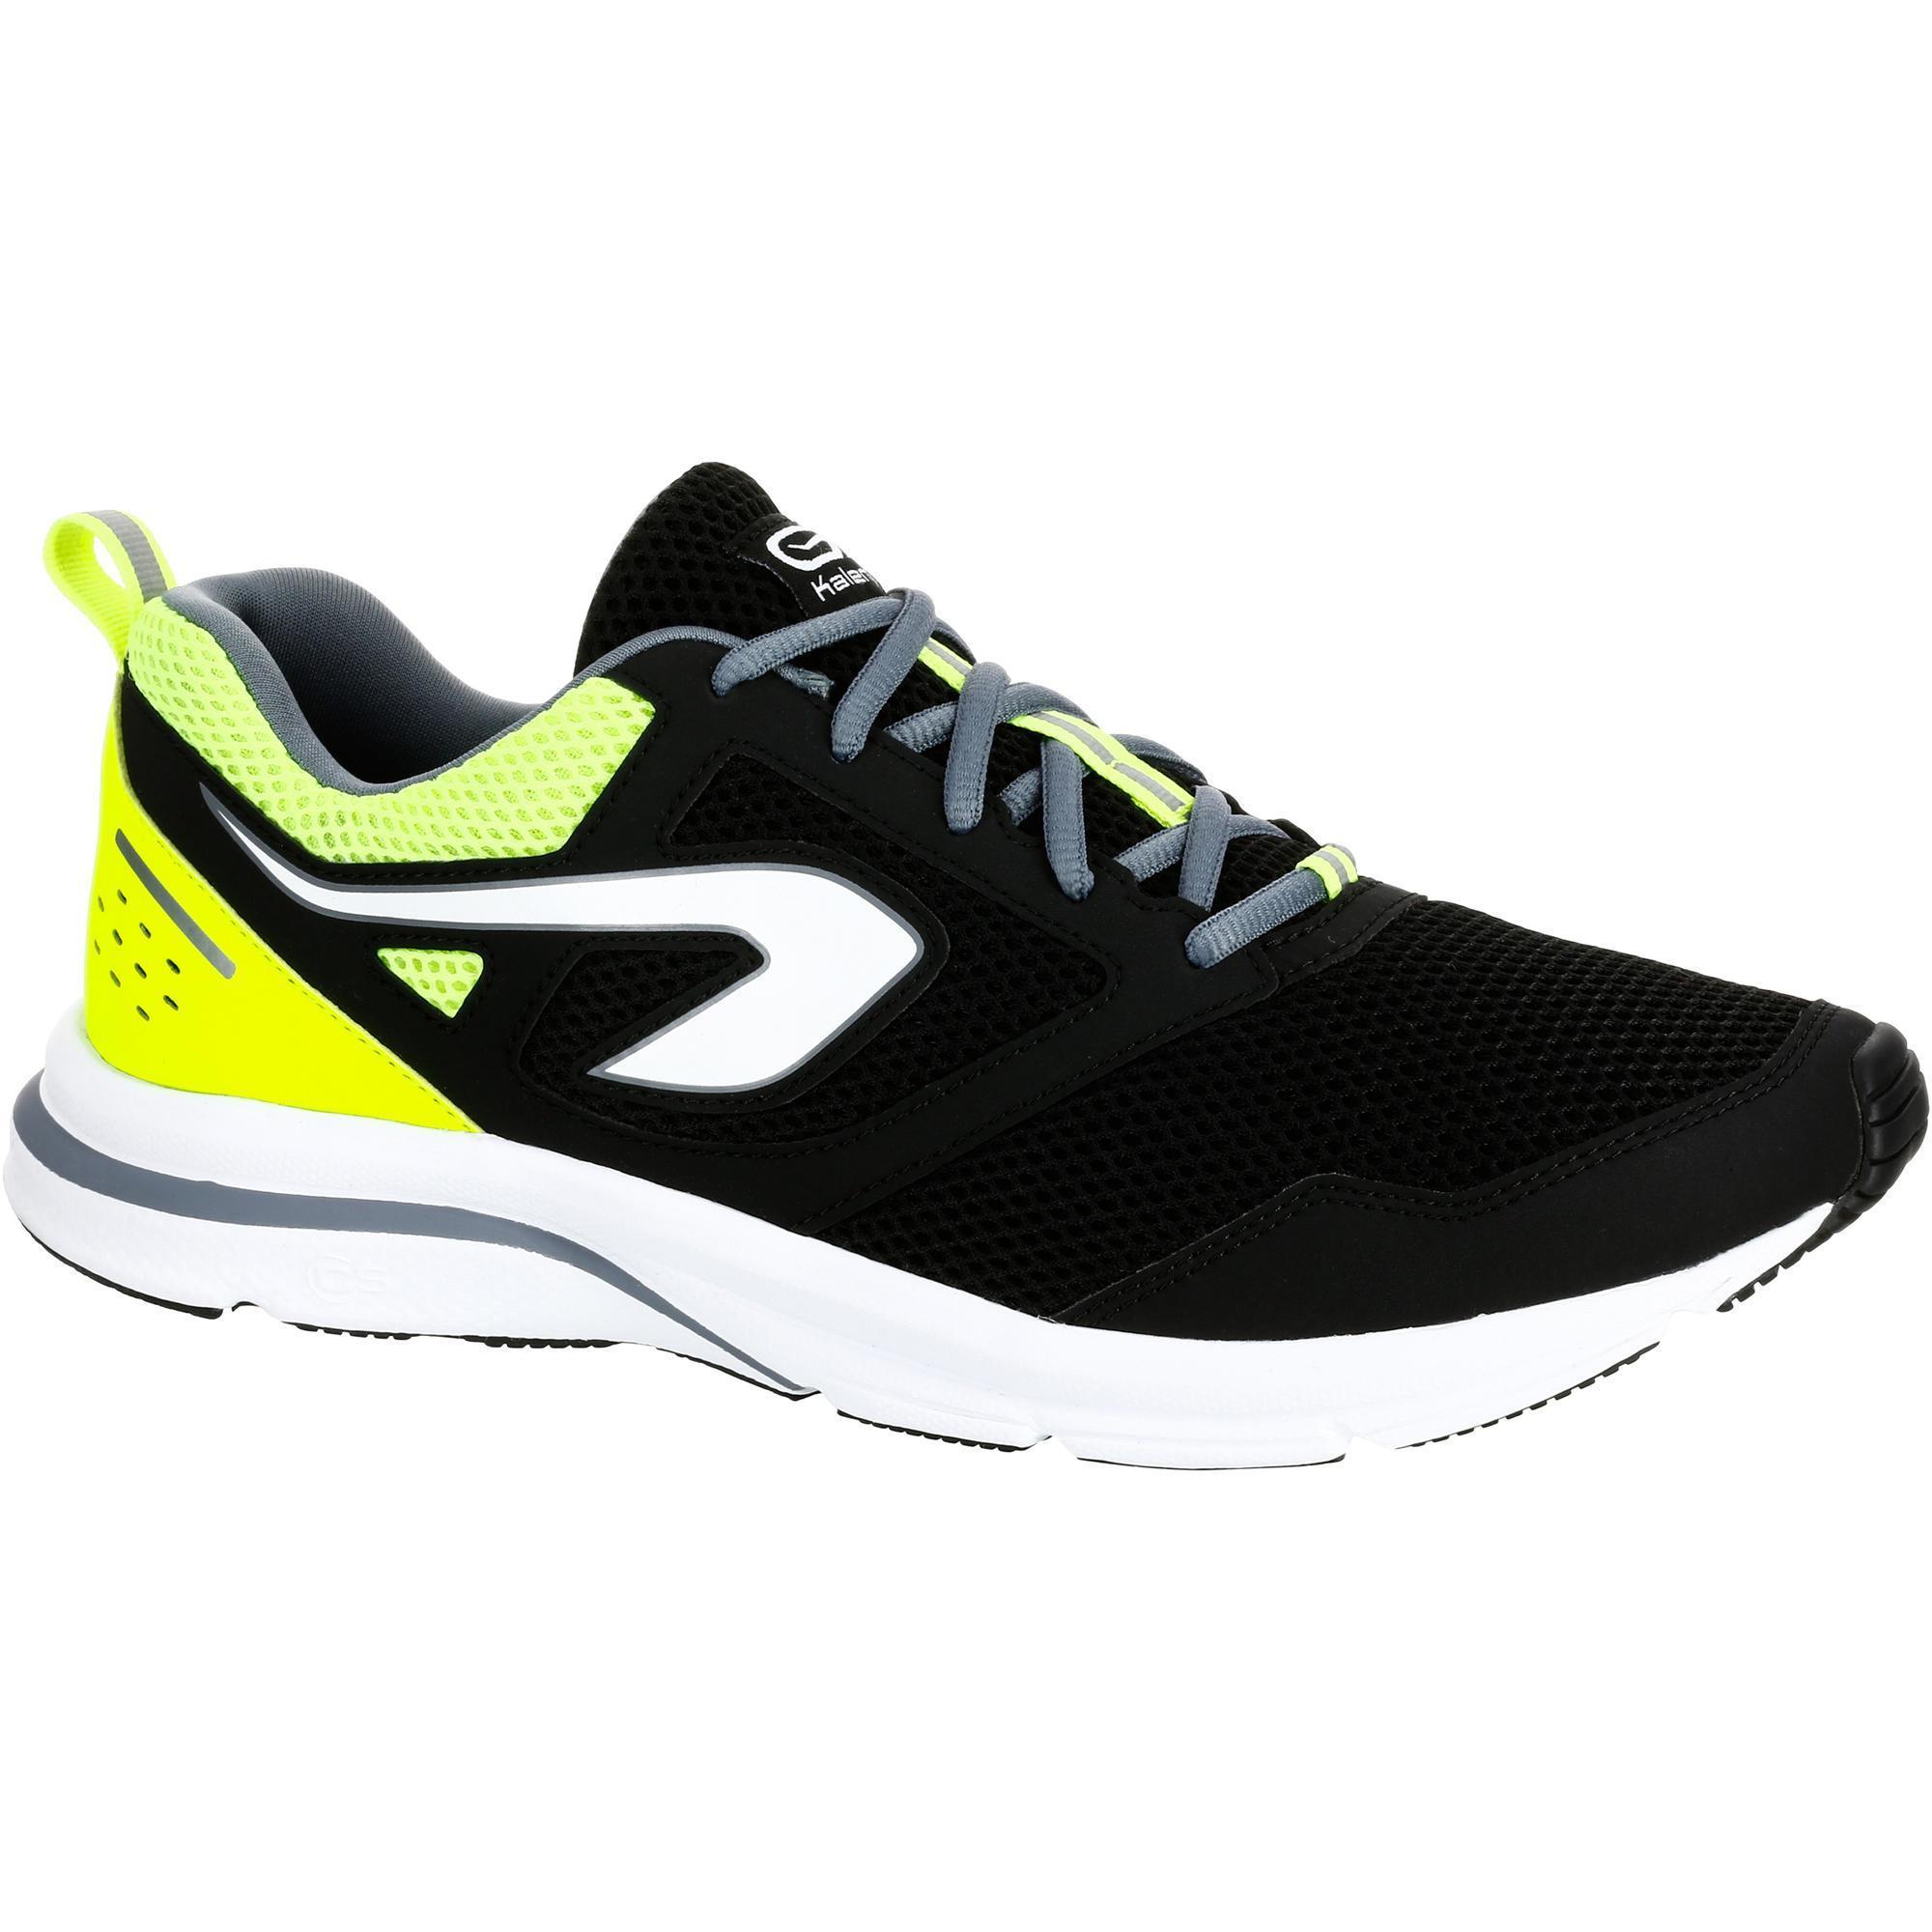 0a2f90c4b05 Comprar zapatillas de running online